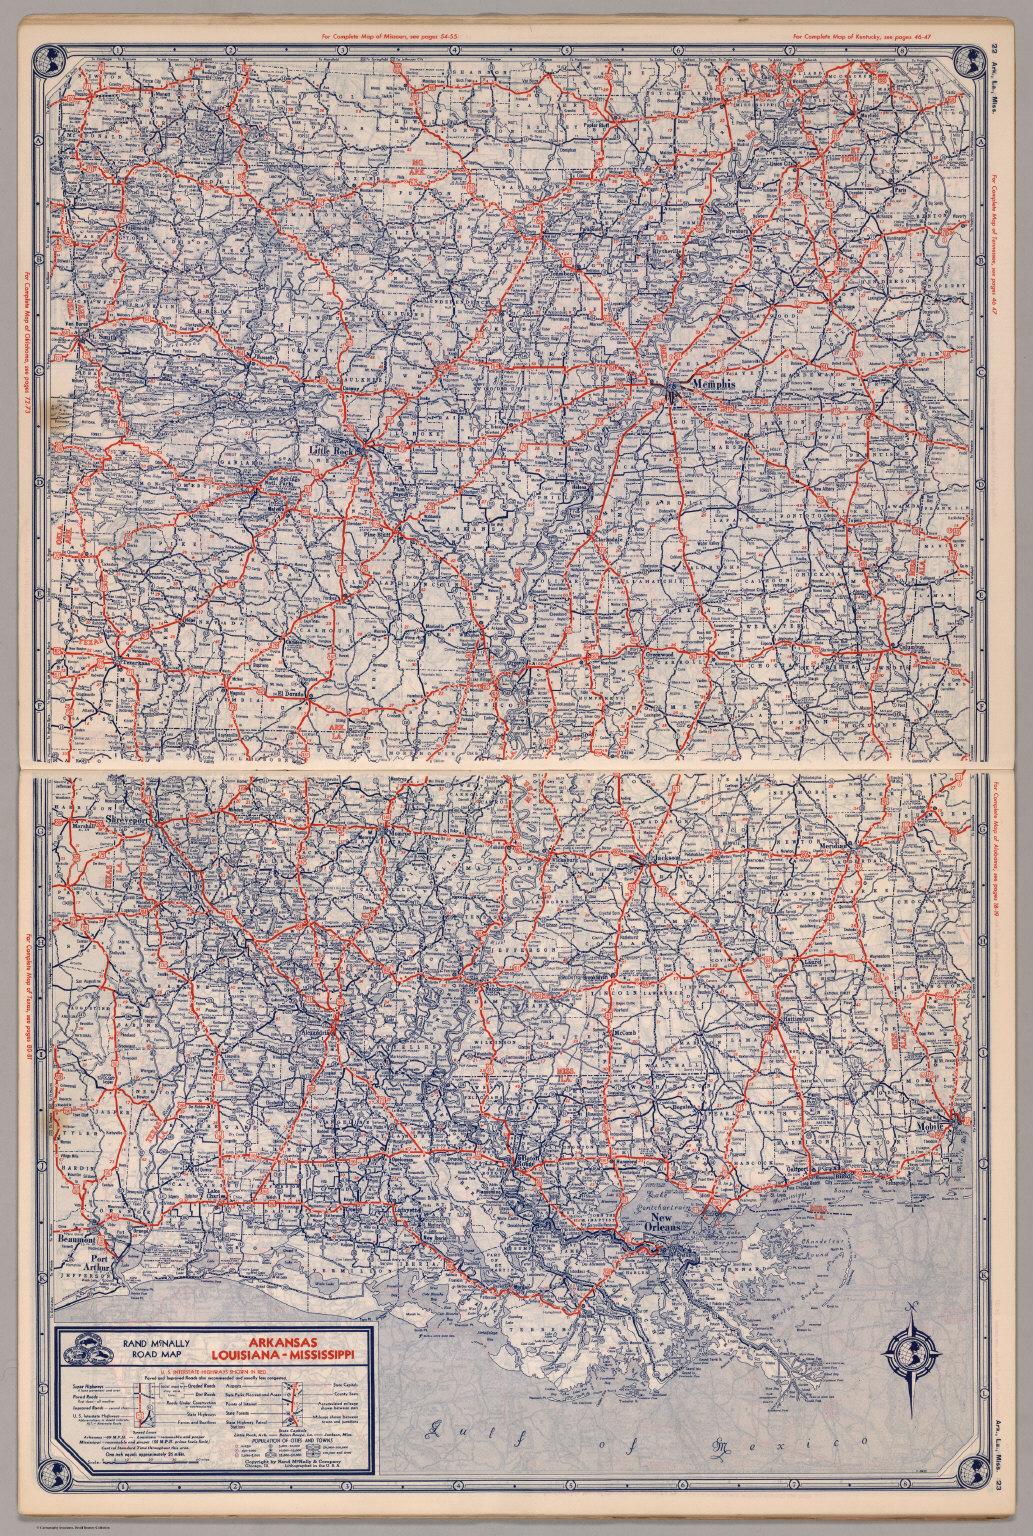 Road Map Of Arkansas Louisiana Mississippi David Rumsey